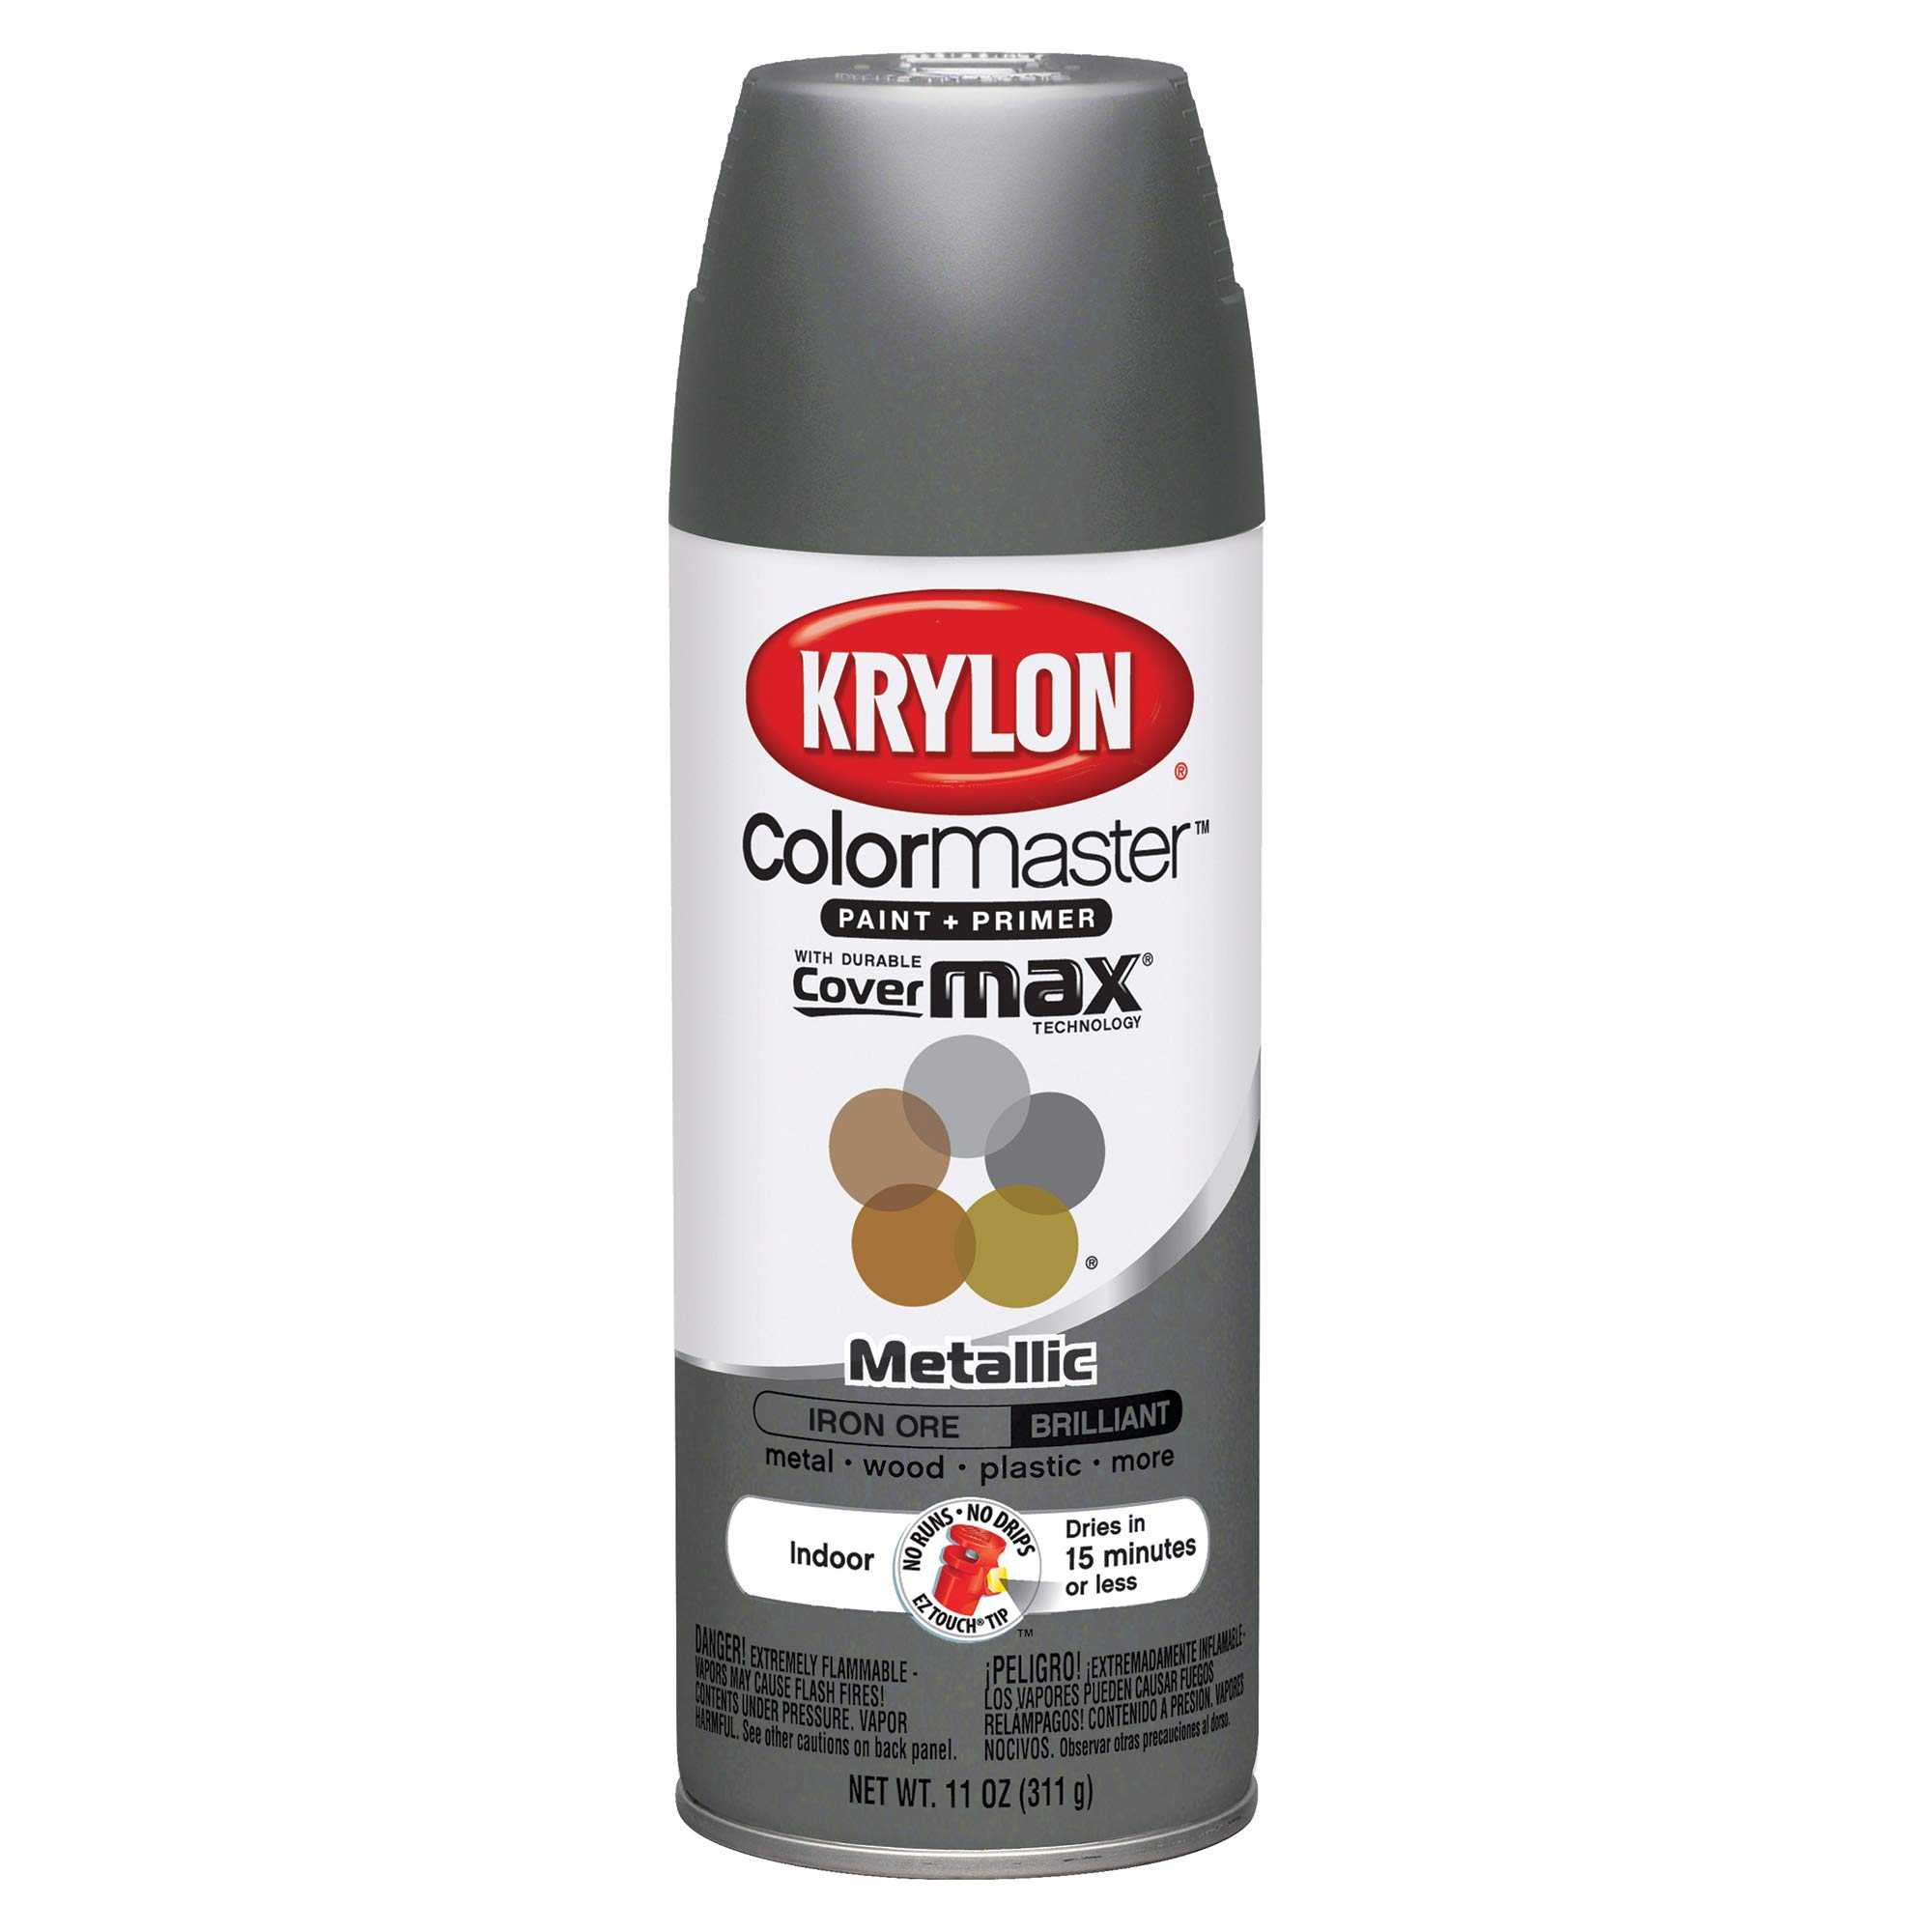 Krylon K05359202 ColorMaster Primer Aerosol Paints, 12oz, Iron Ore